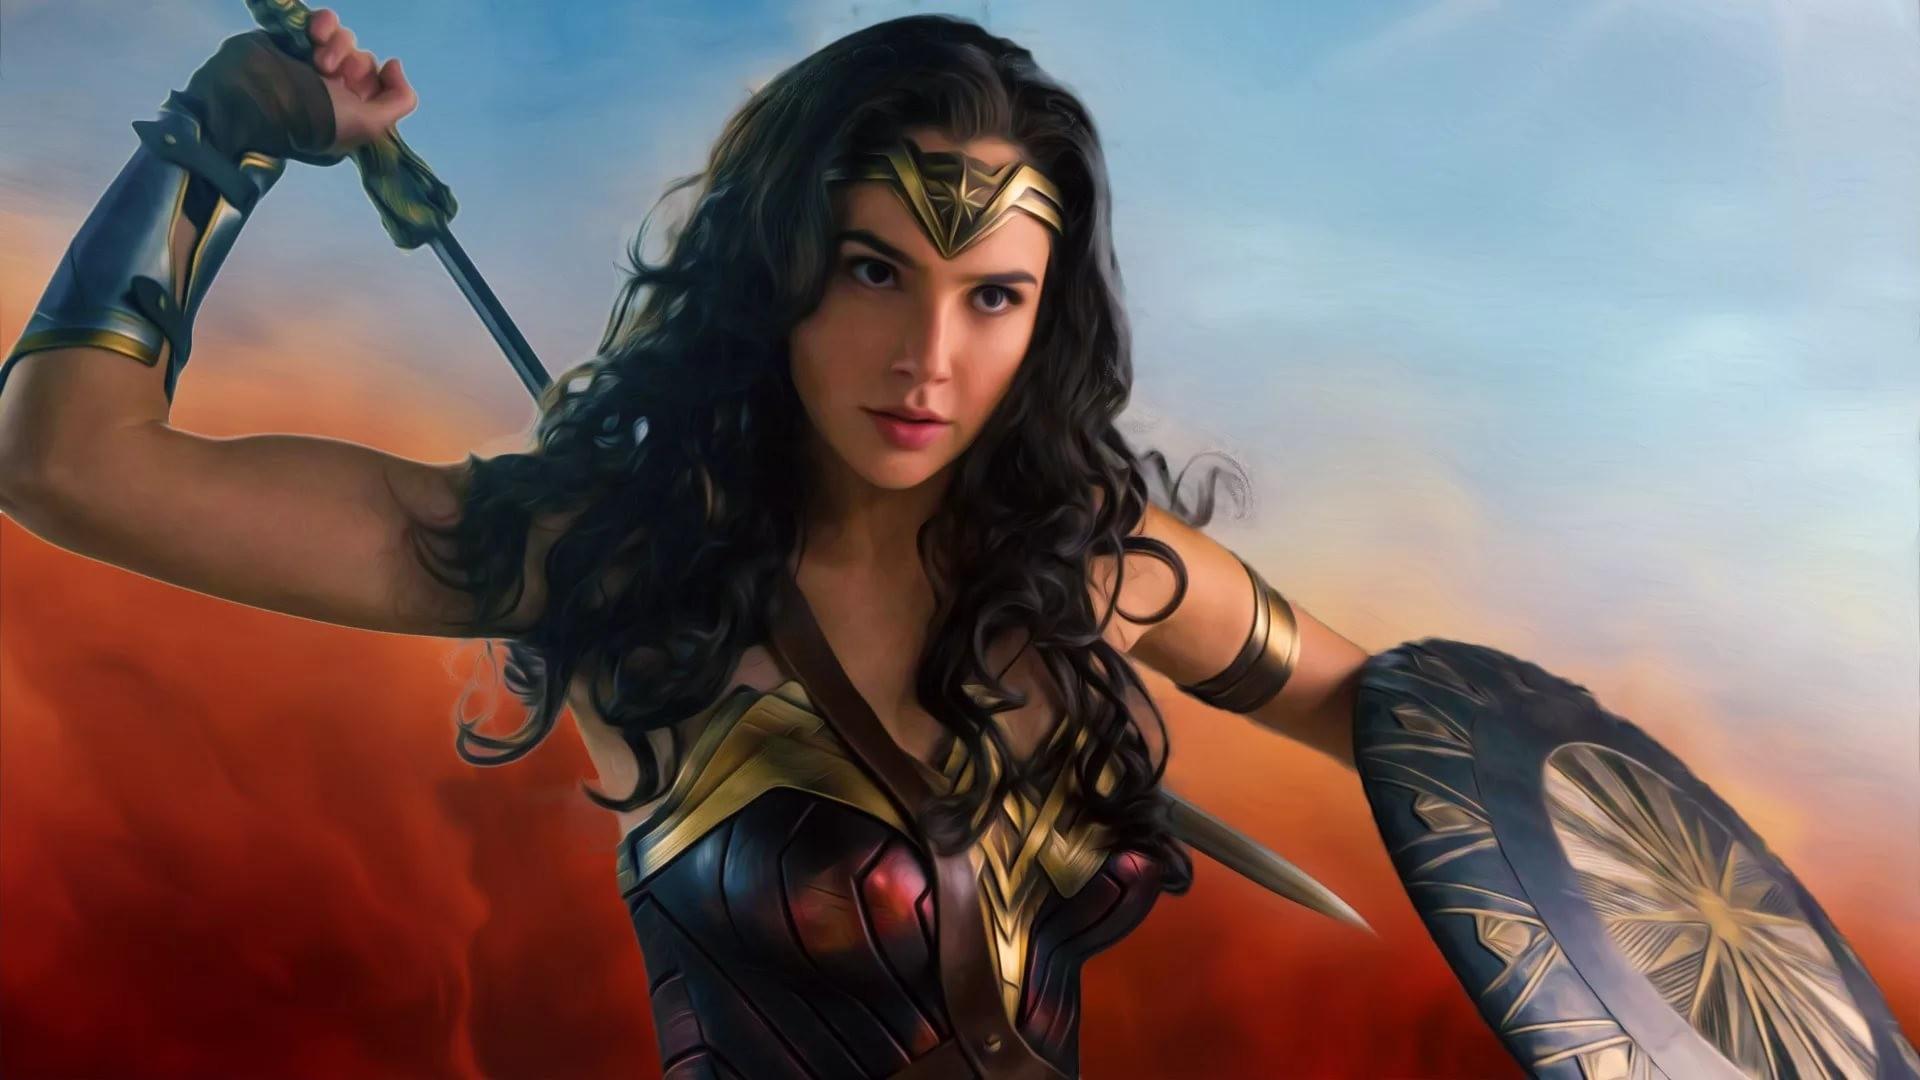 Wonder Woman Wallpapers: Wonder Woman Wallpaper Screen Savers (67+ Images